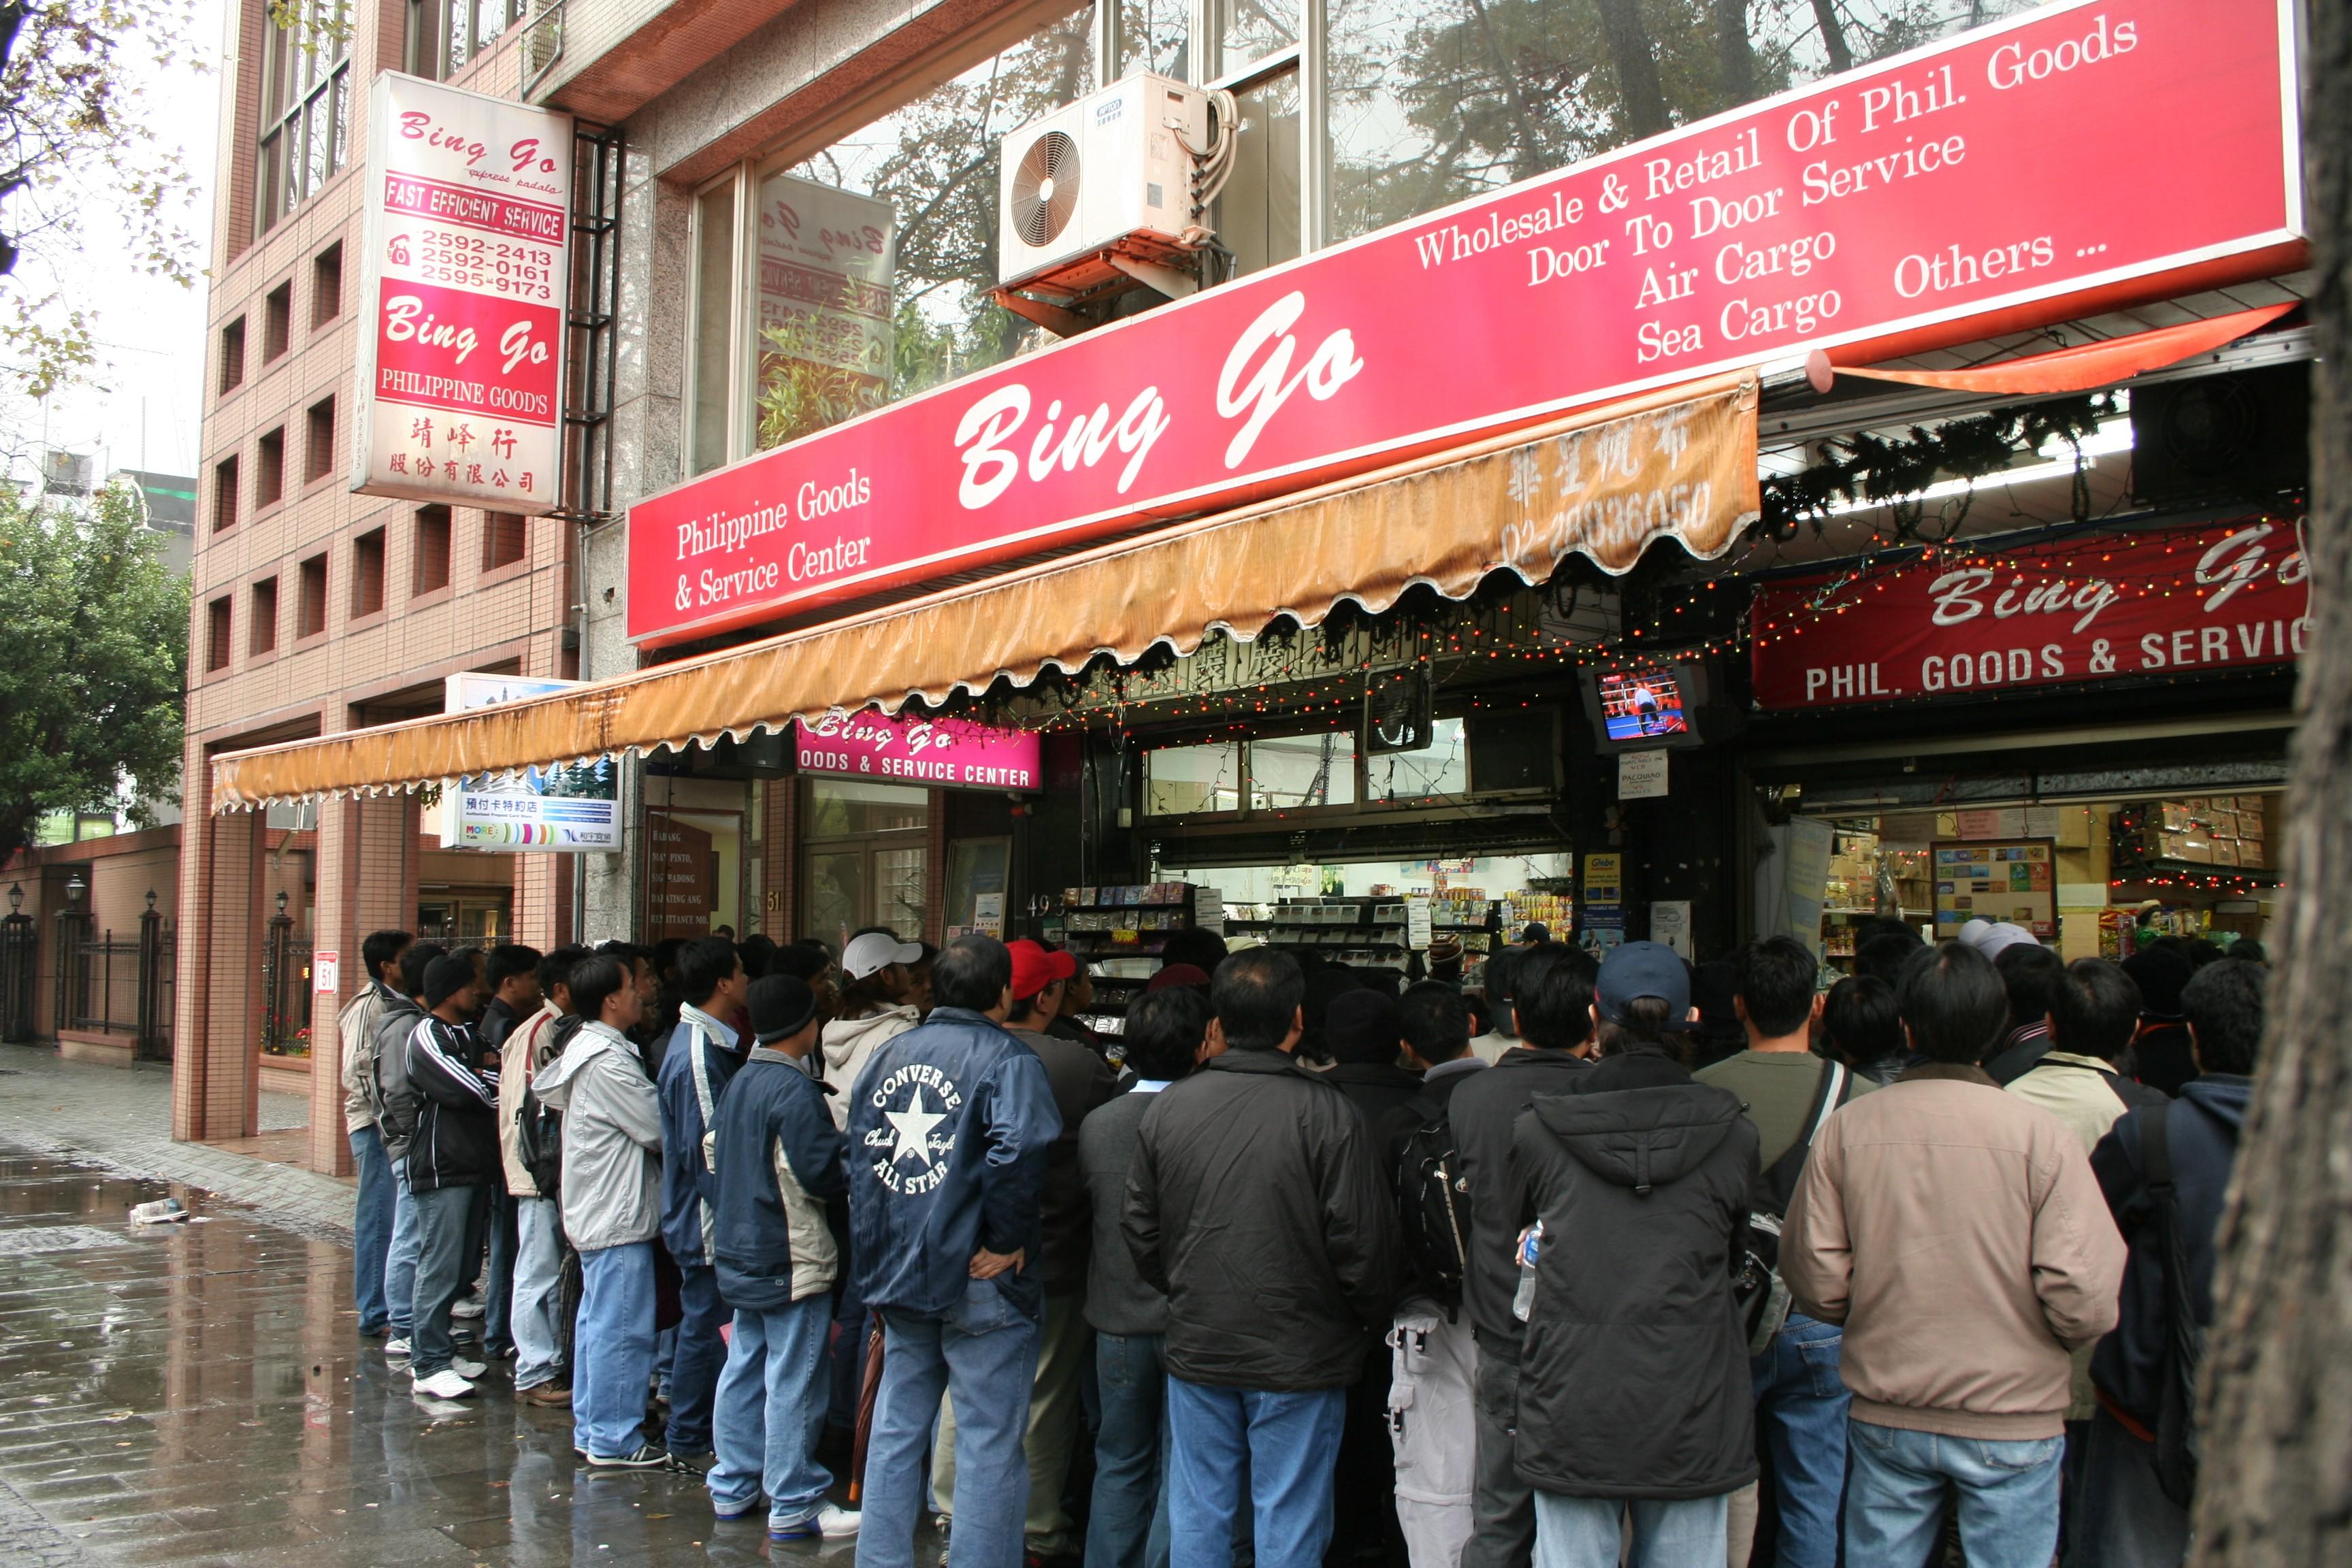 Bing_Go_Philippine_Goods_on_Zhong_Shan_NRdSec3_Taipei_city